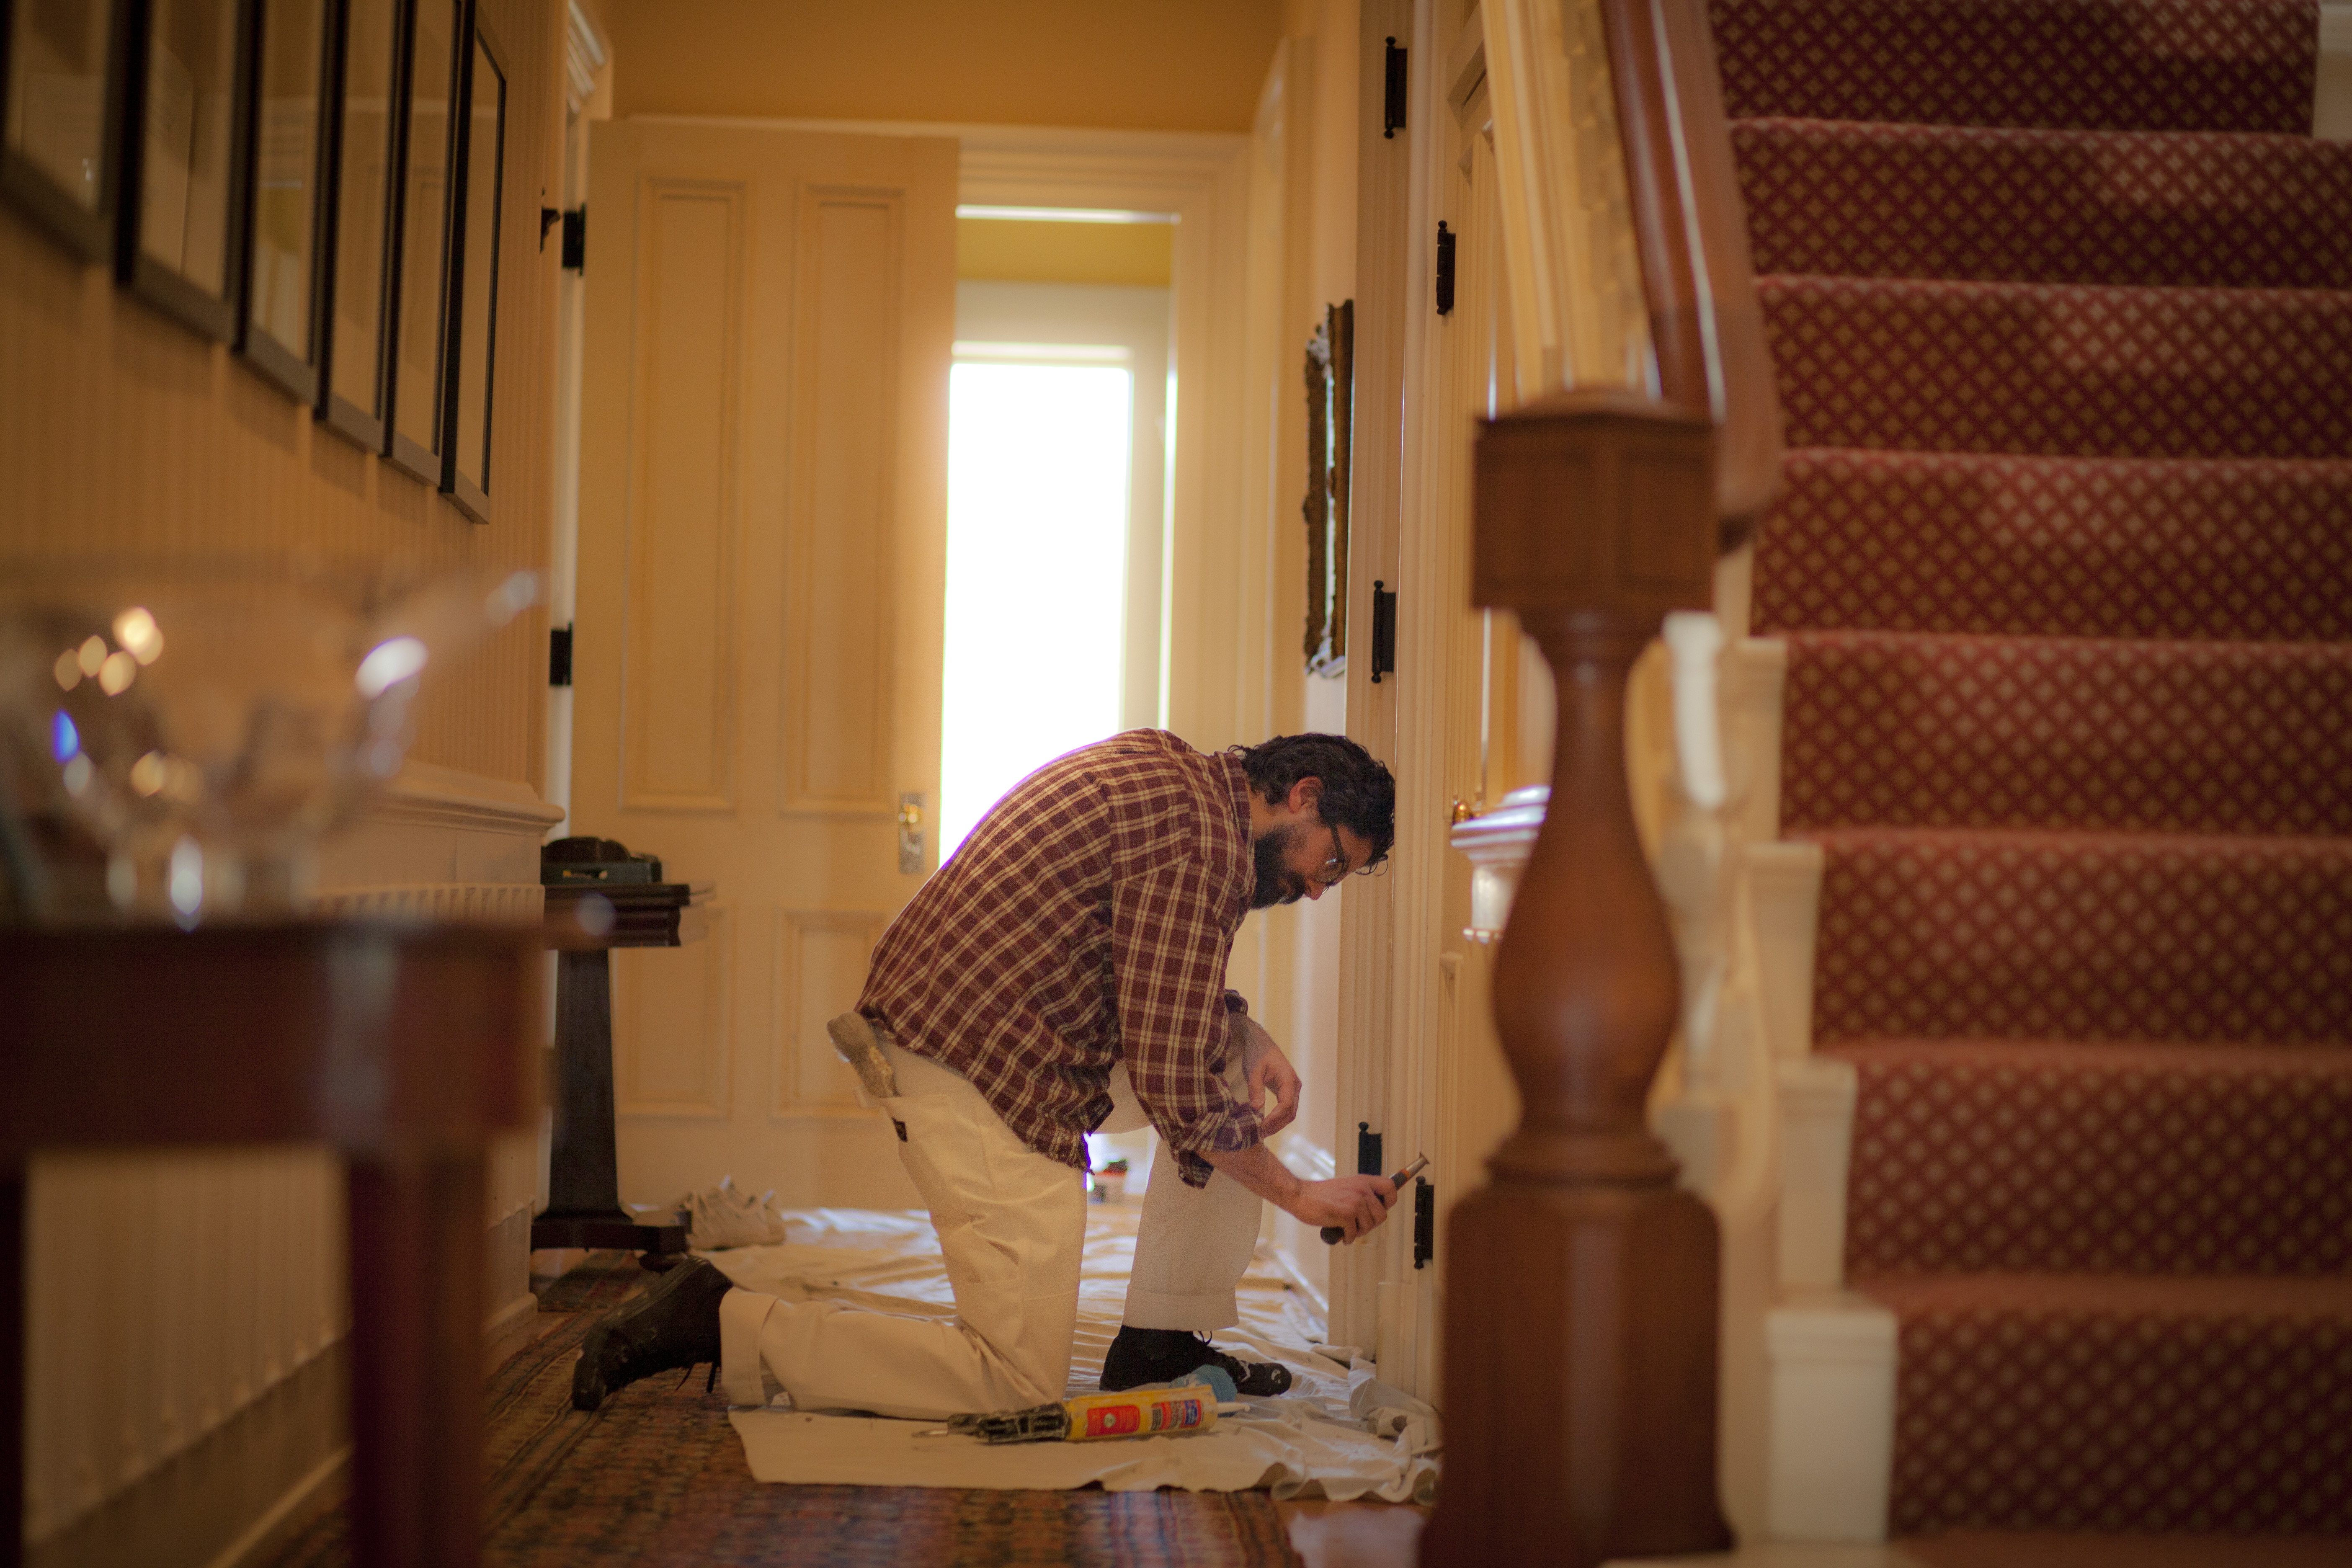 Interior house painting interior painting services boston - Interior exterior painting services set ...